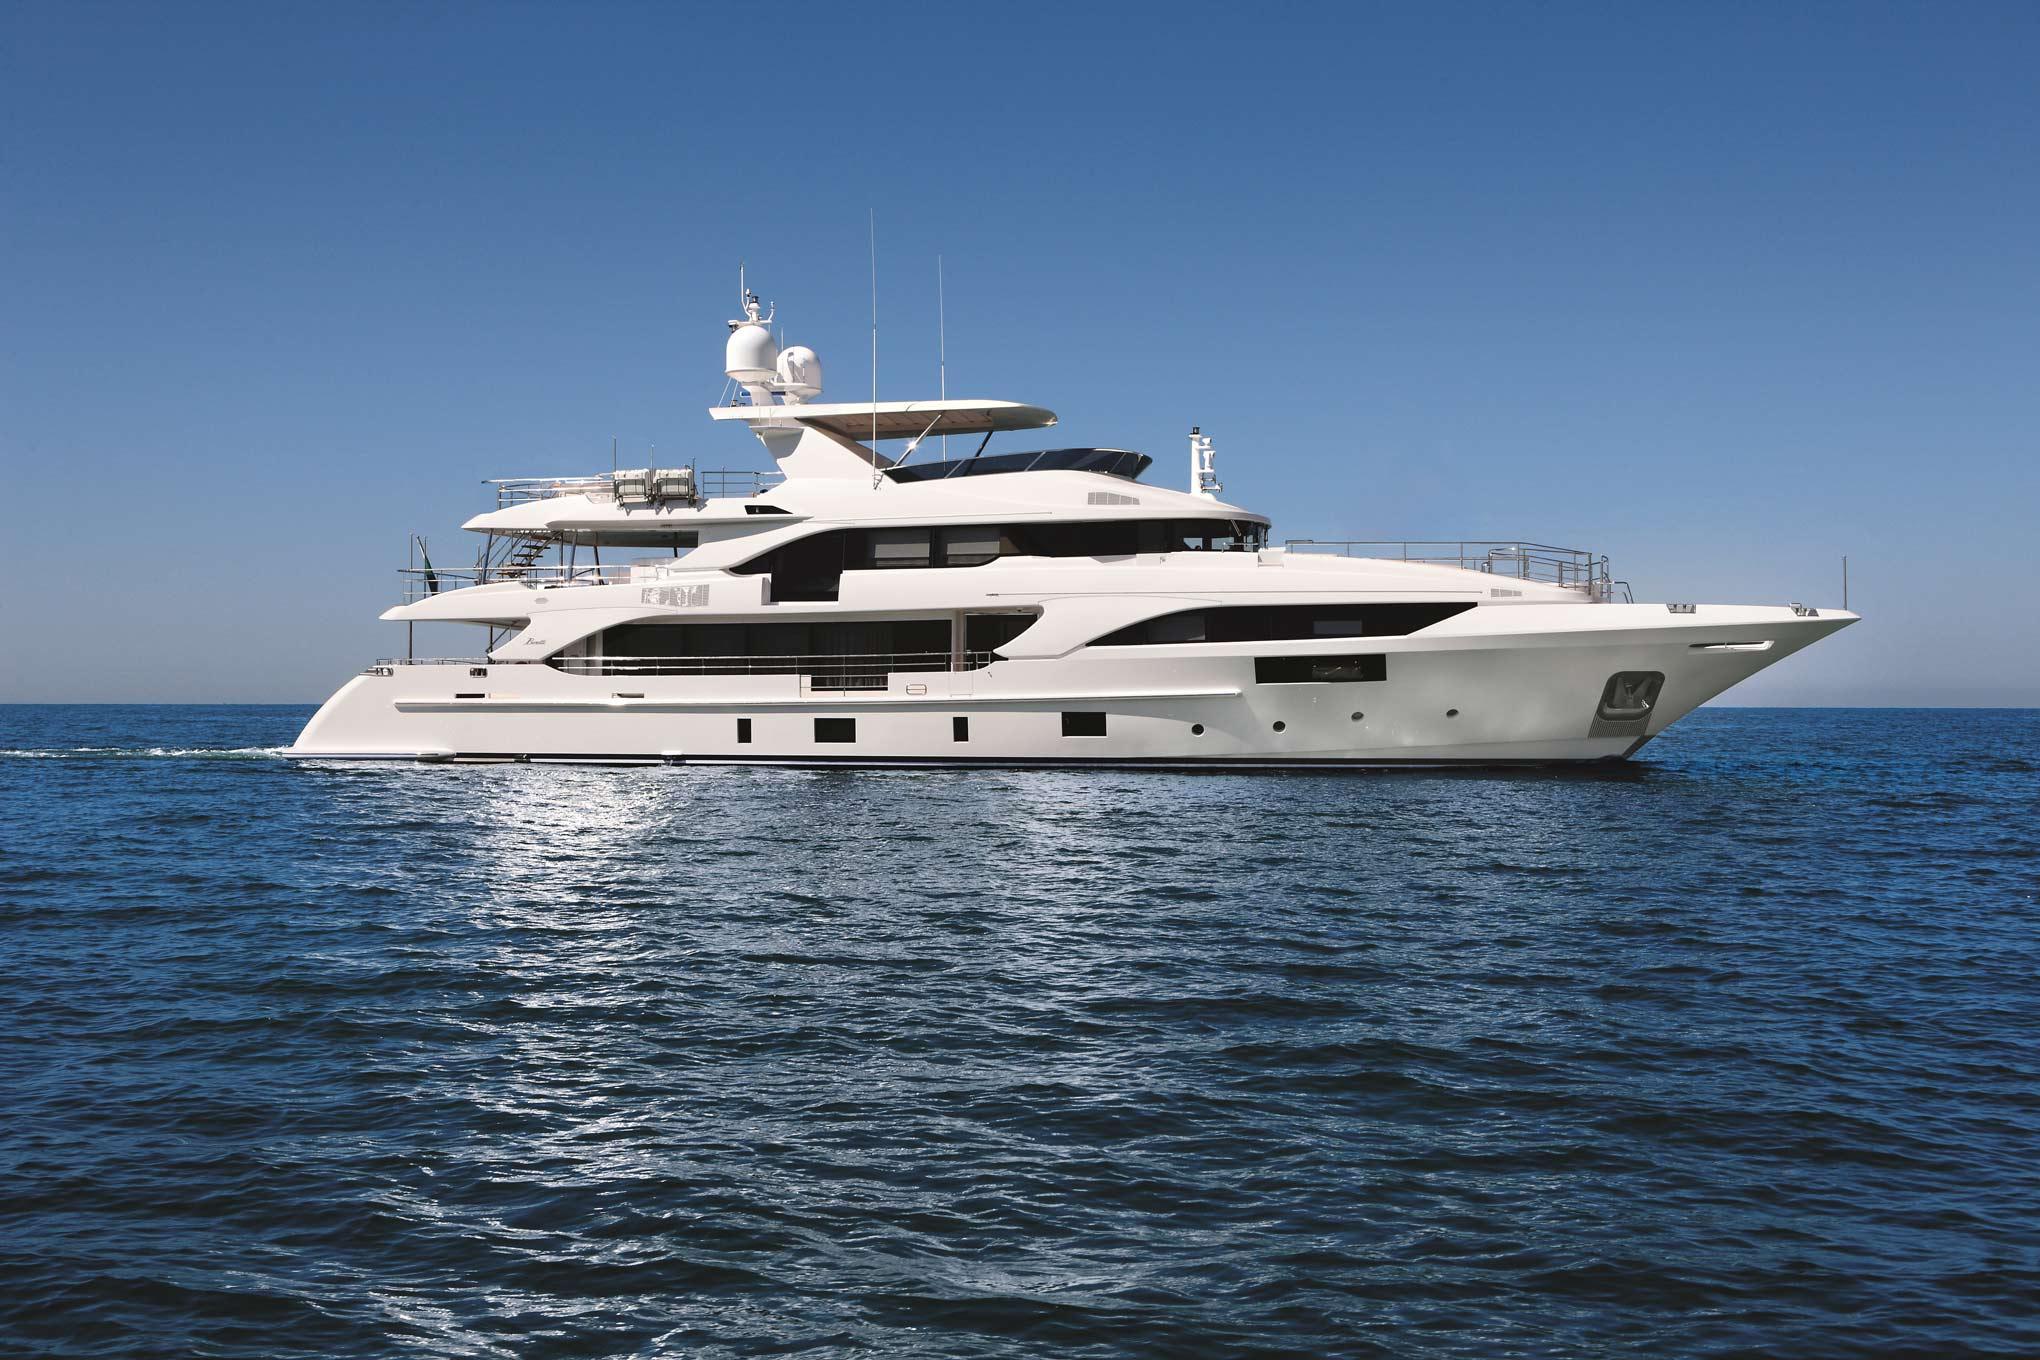 Benetti Classic Supreme - sistership to superyacht HAPPY ME